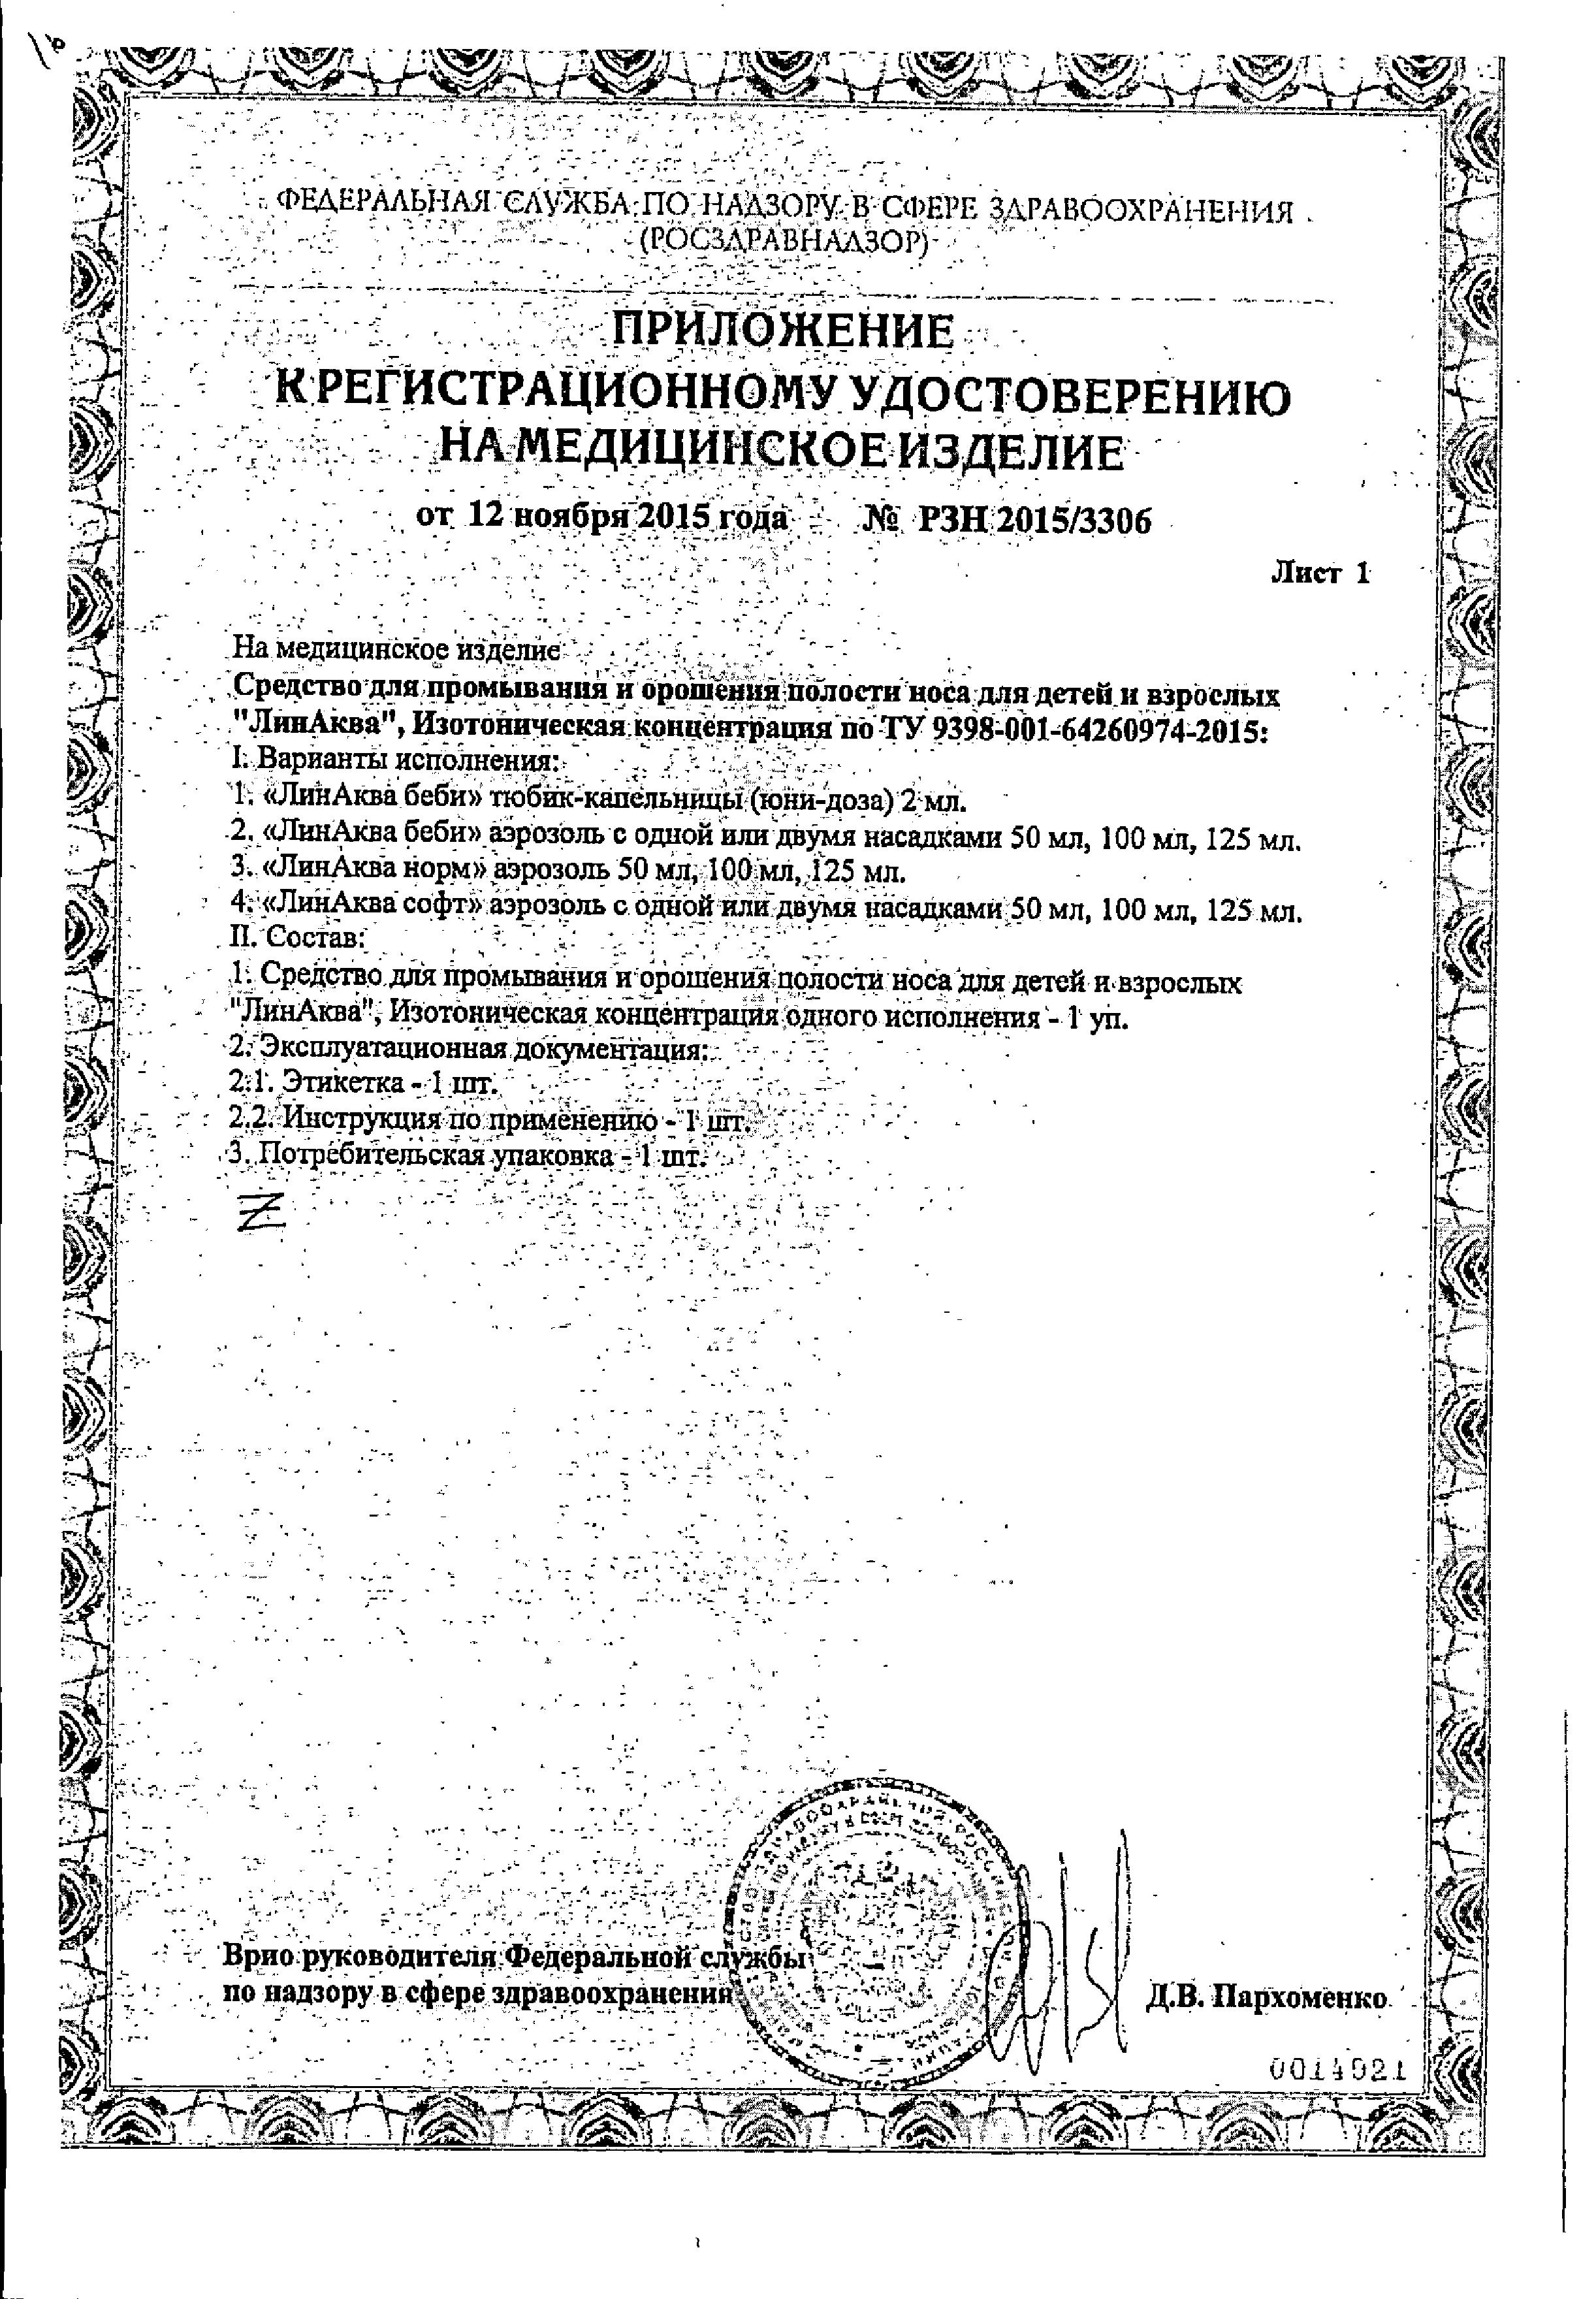 ЛинАква софт сертификат